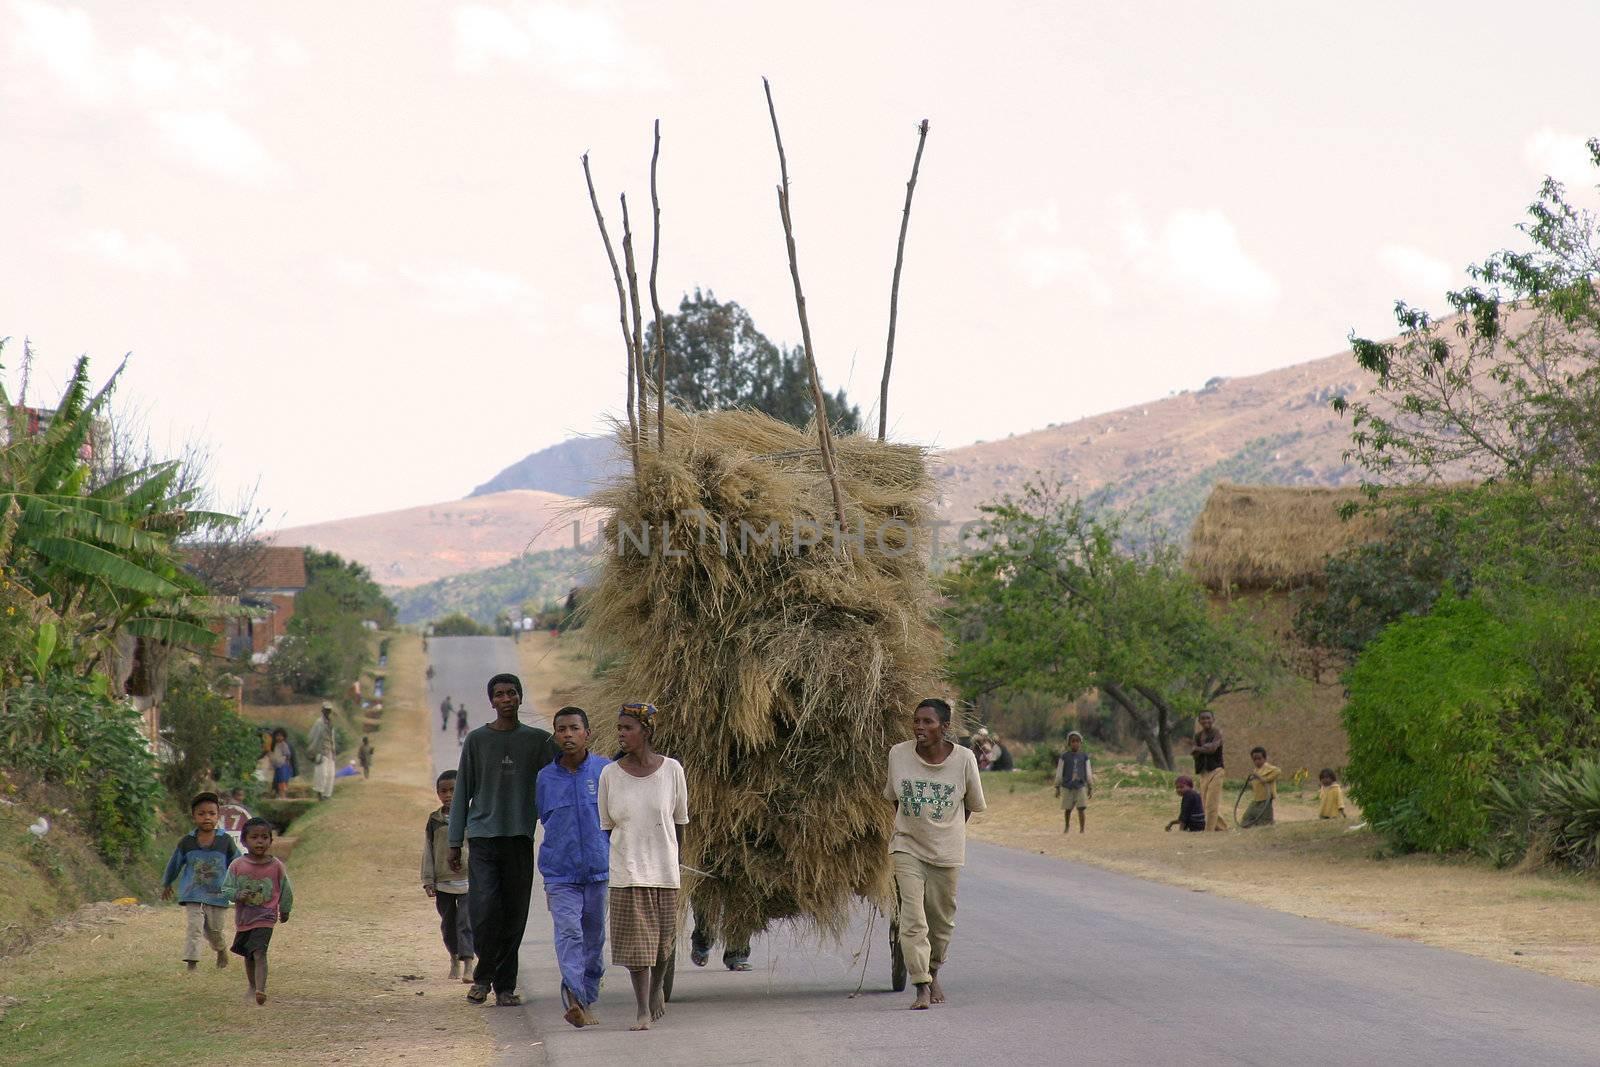 Transportation in Madagascar